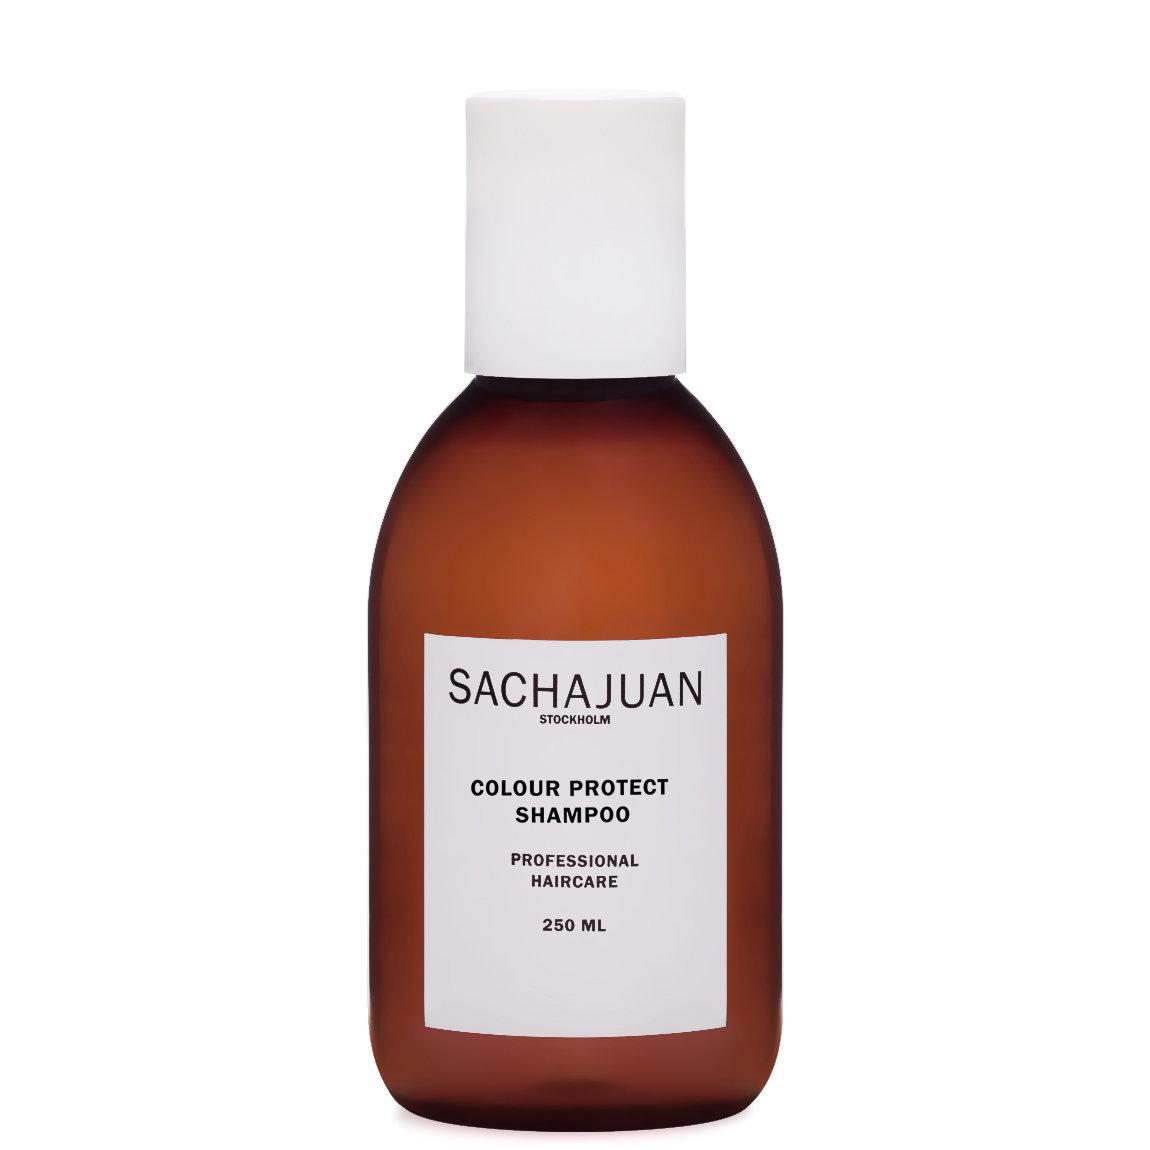 SACHAJUAN Colour Protect Shampoo product swatch.